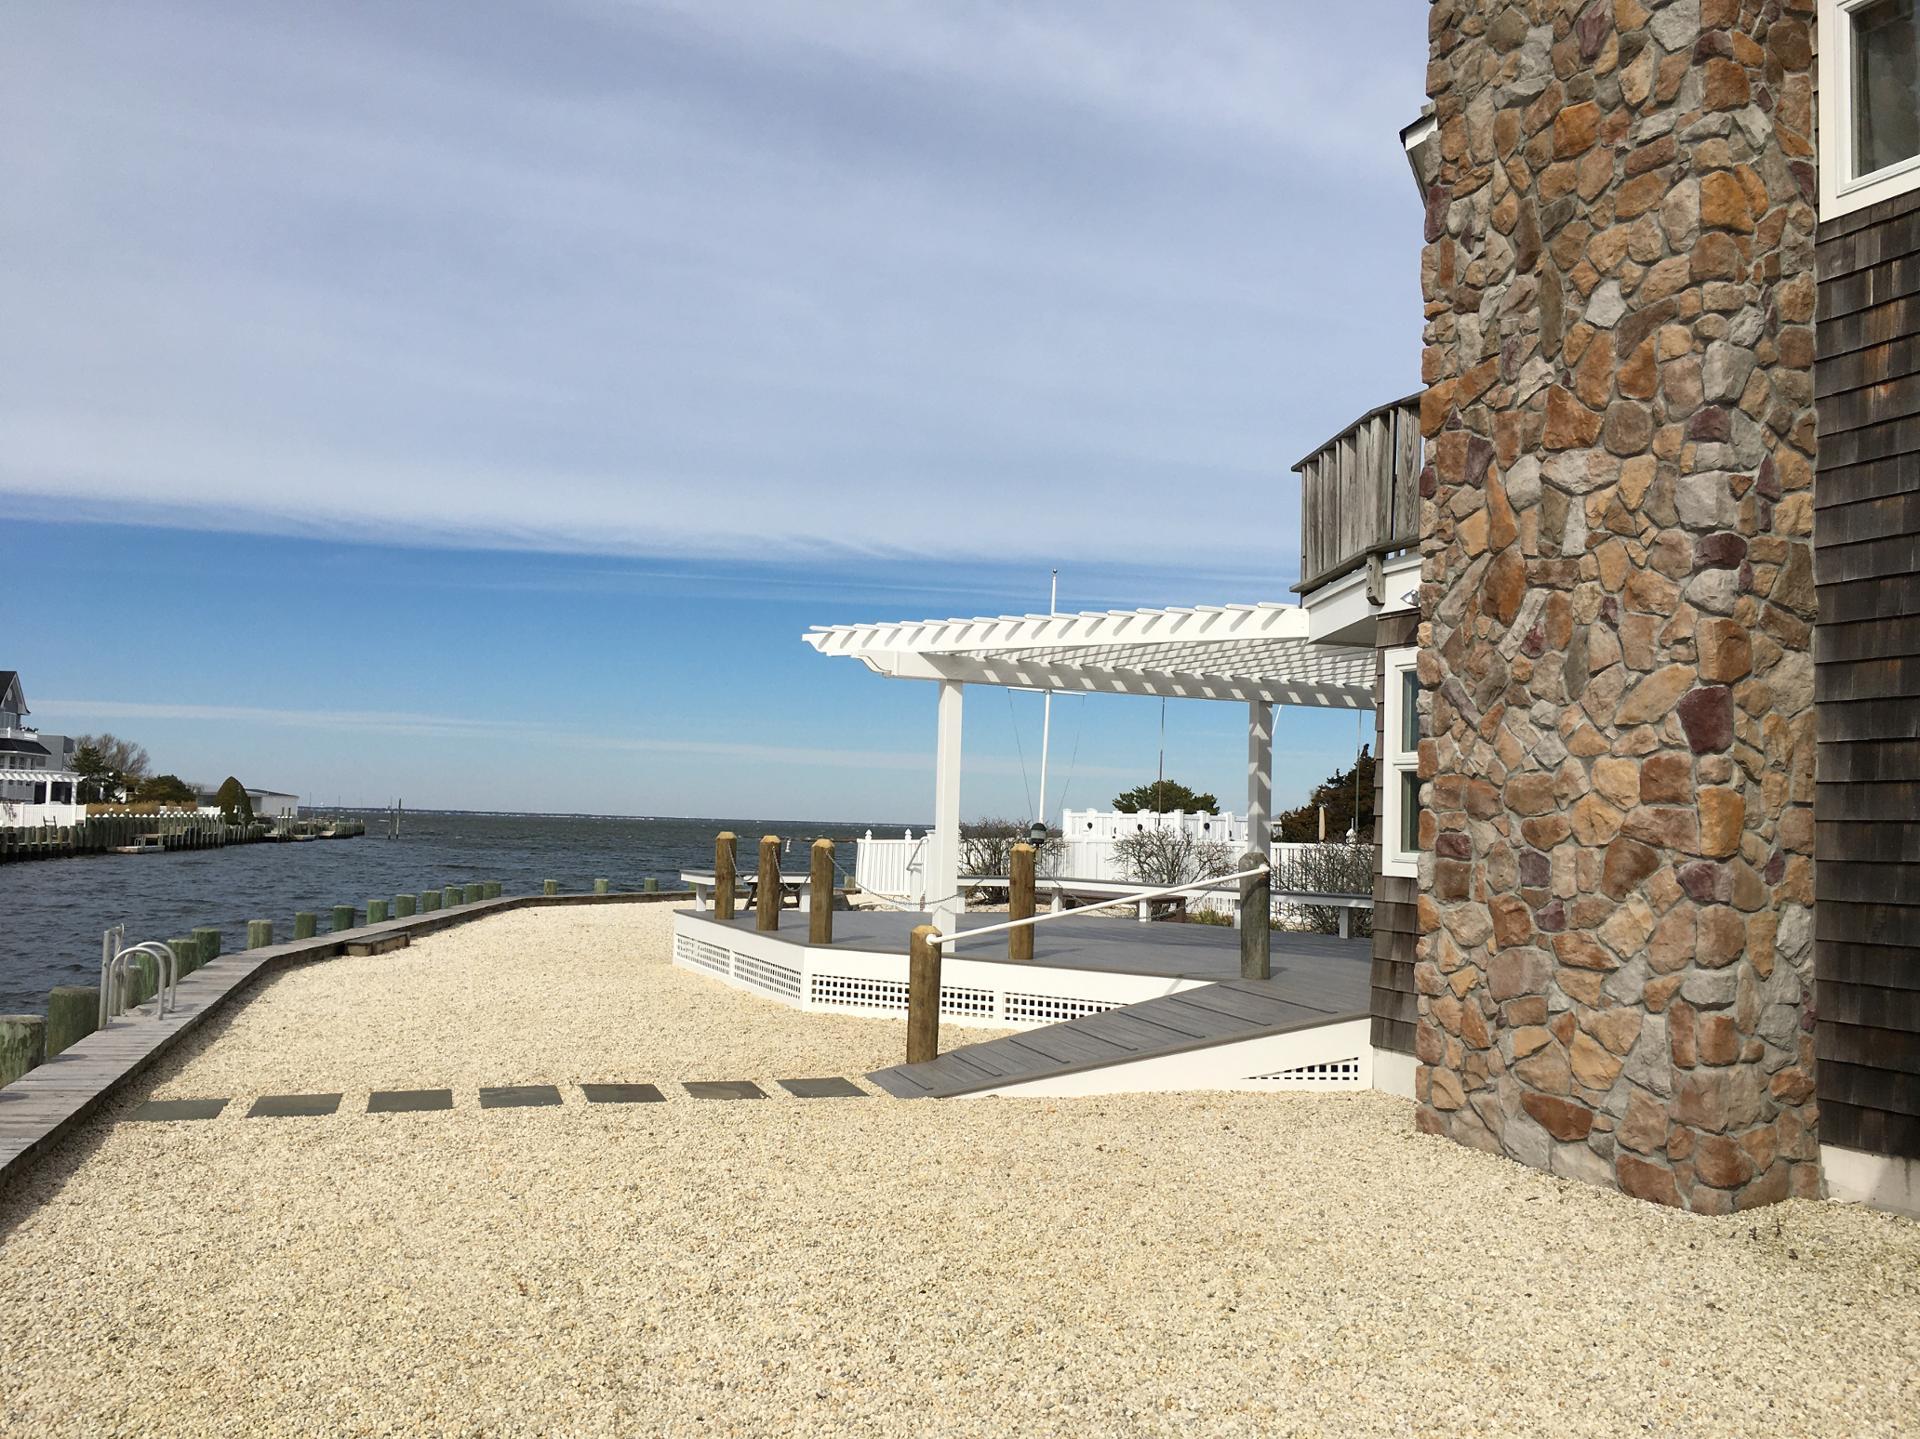 Vacation rental in Loveladies New Jersey